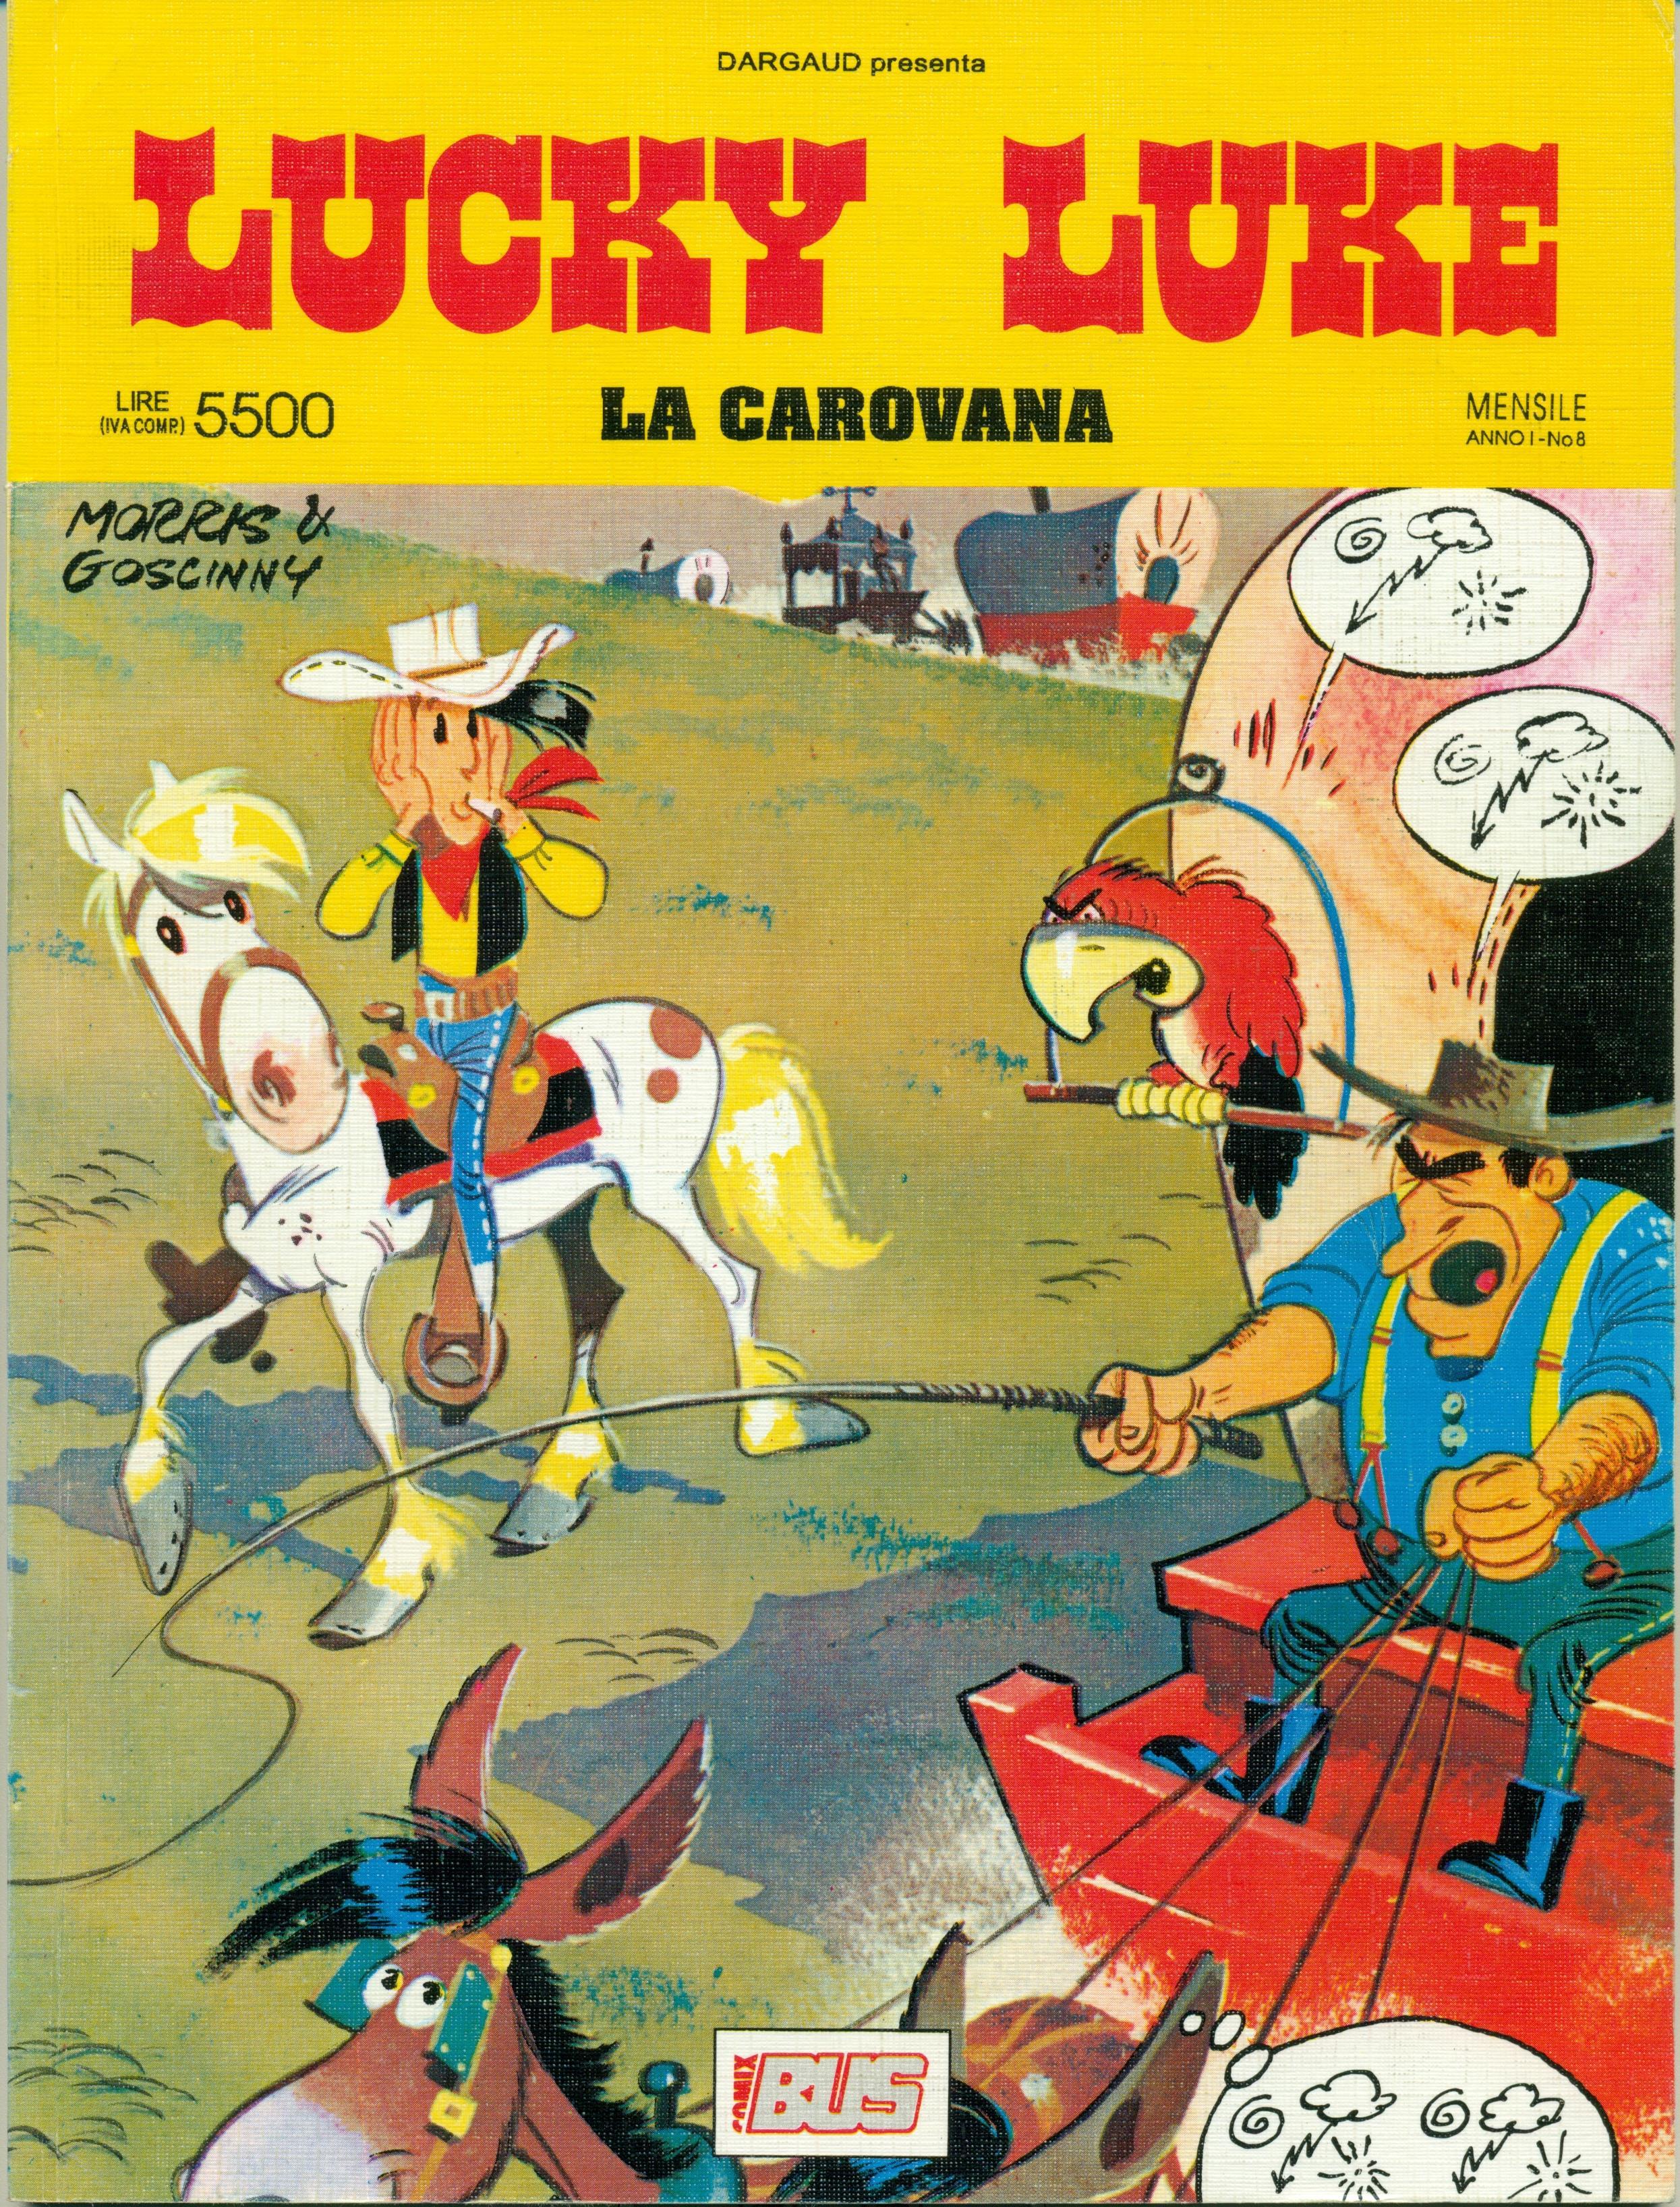 Lucky Luke - La carovana